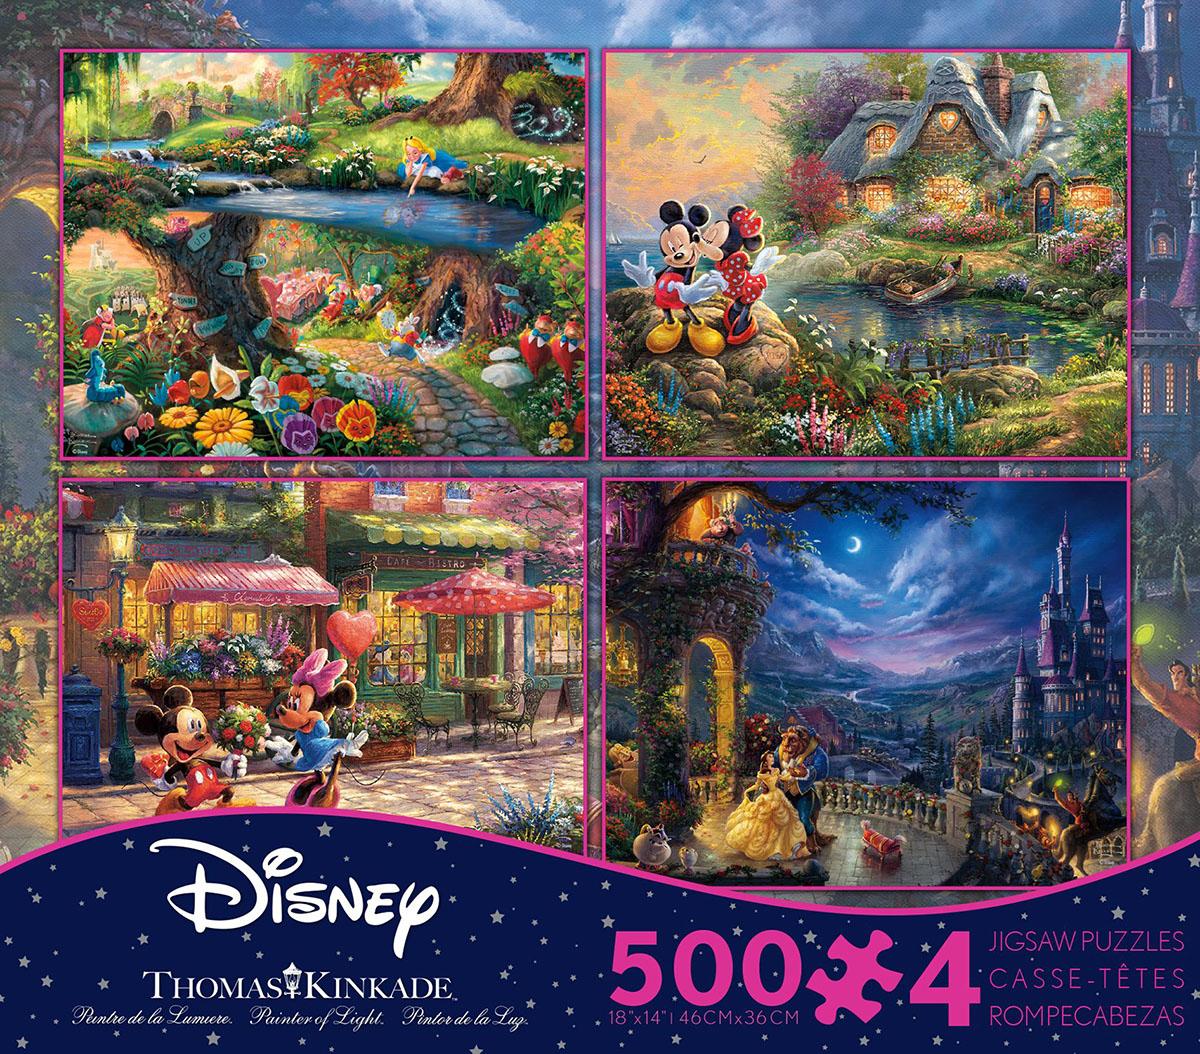 Iconic Disney 4 in 1, 500 Piece Thomas Kinkade Disney Dreams Multi-Pack Disney Jigsaw Puzzle